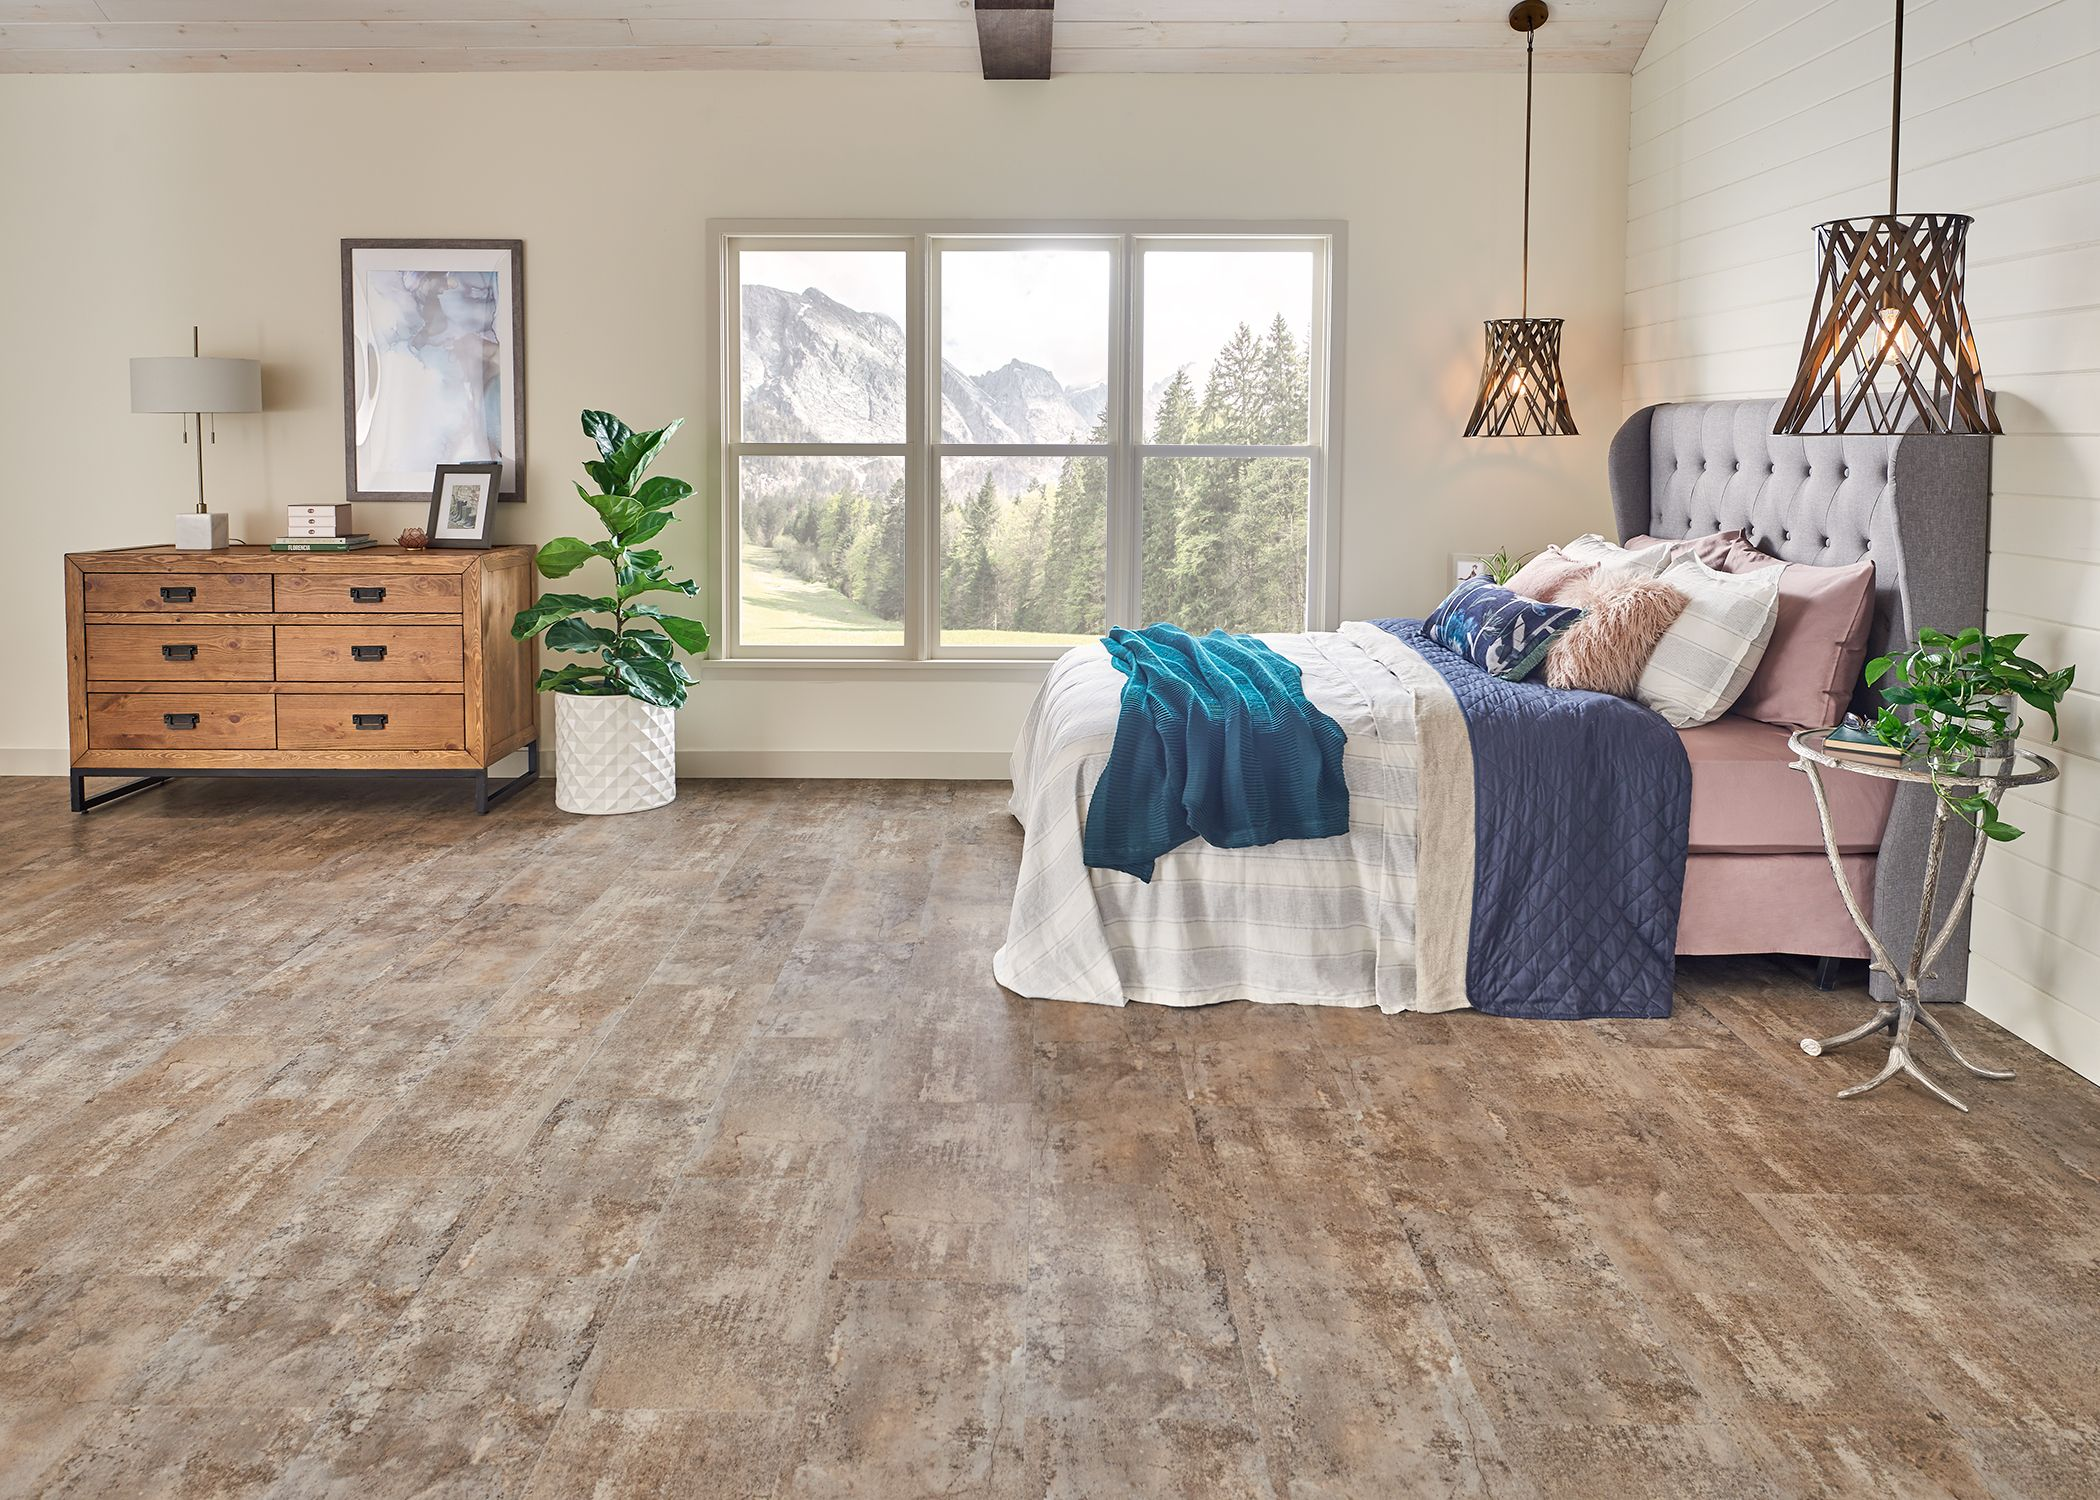 Coreluxe 5mm Venice Beach Evp In 2020 House Flooring Flooring Lumber Liquidators Flooring